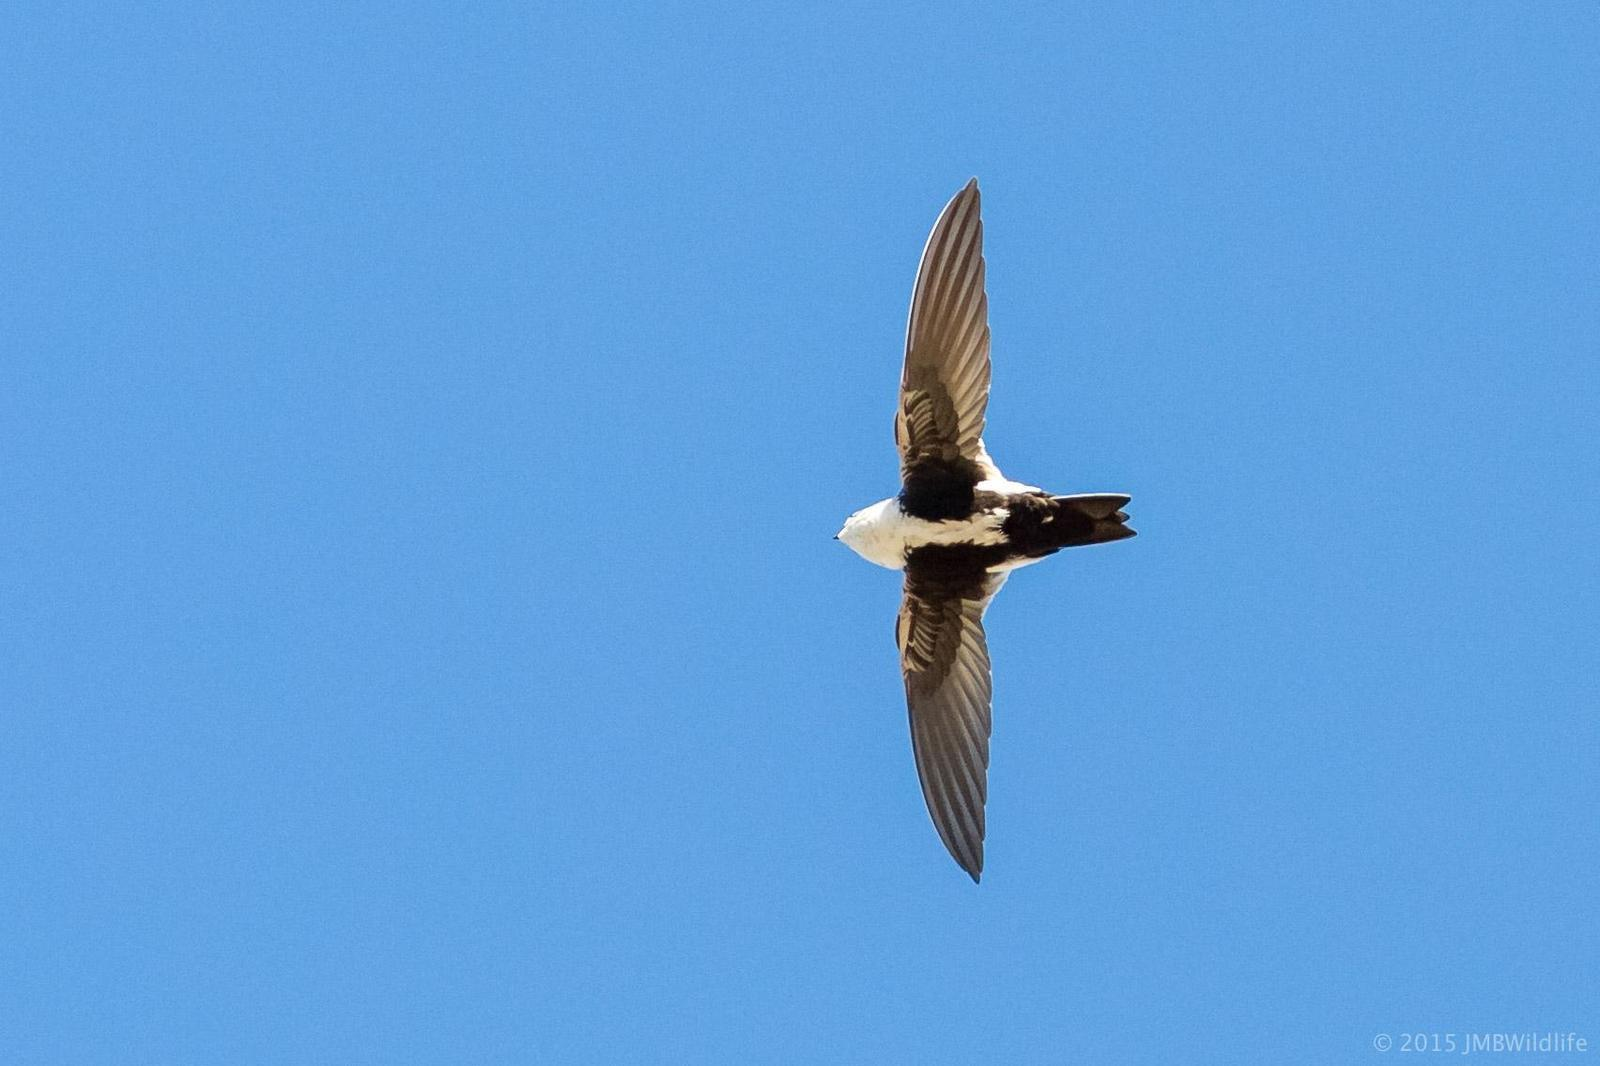 White-throated Swift Photo by Jeff Bray